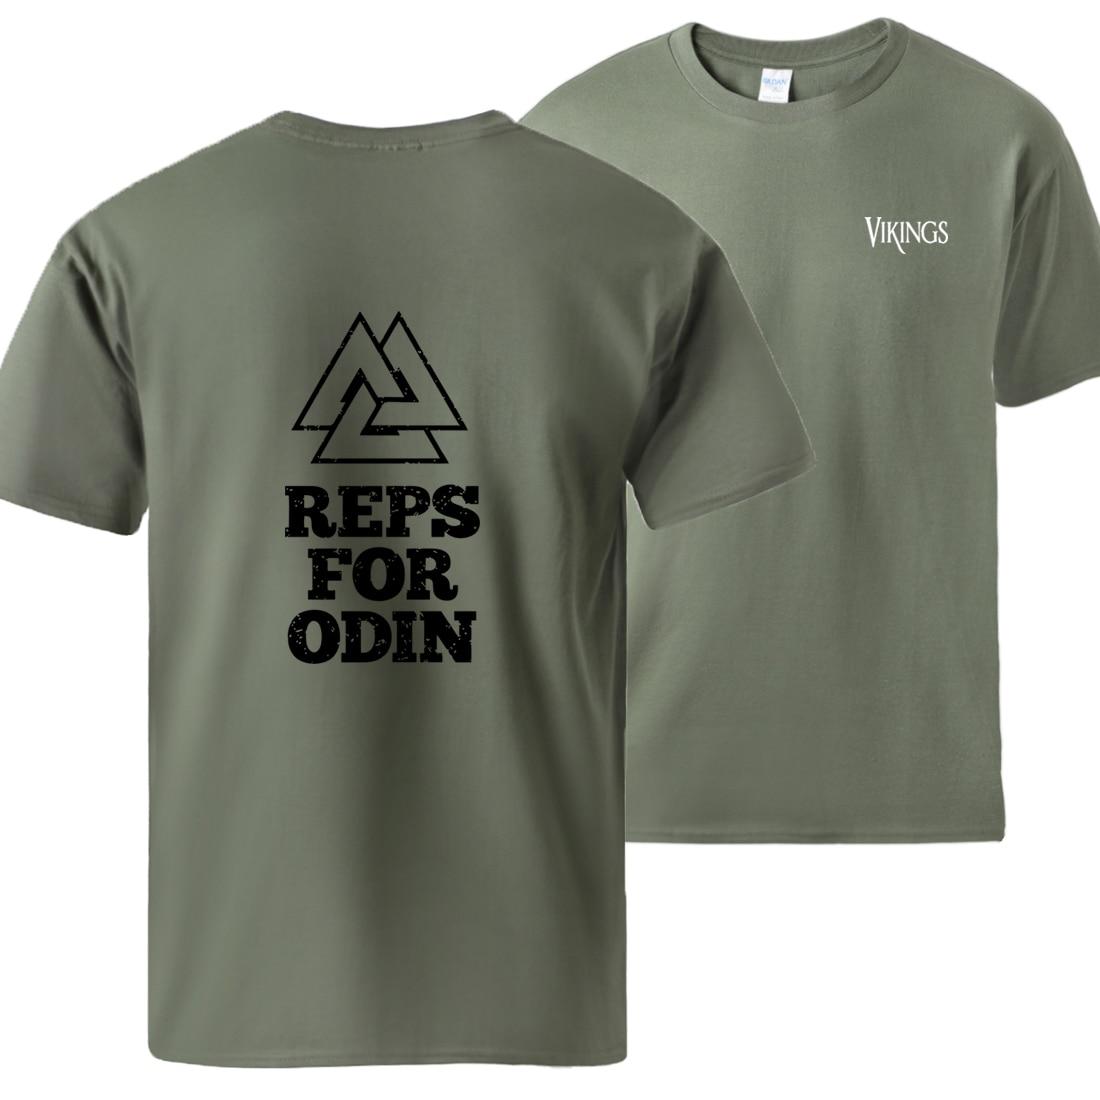 vikings shirts mens